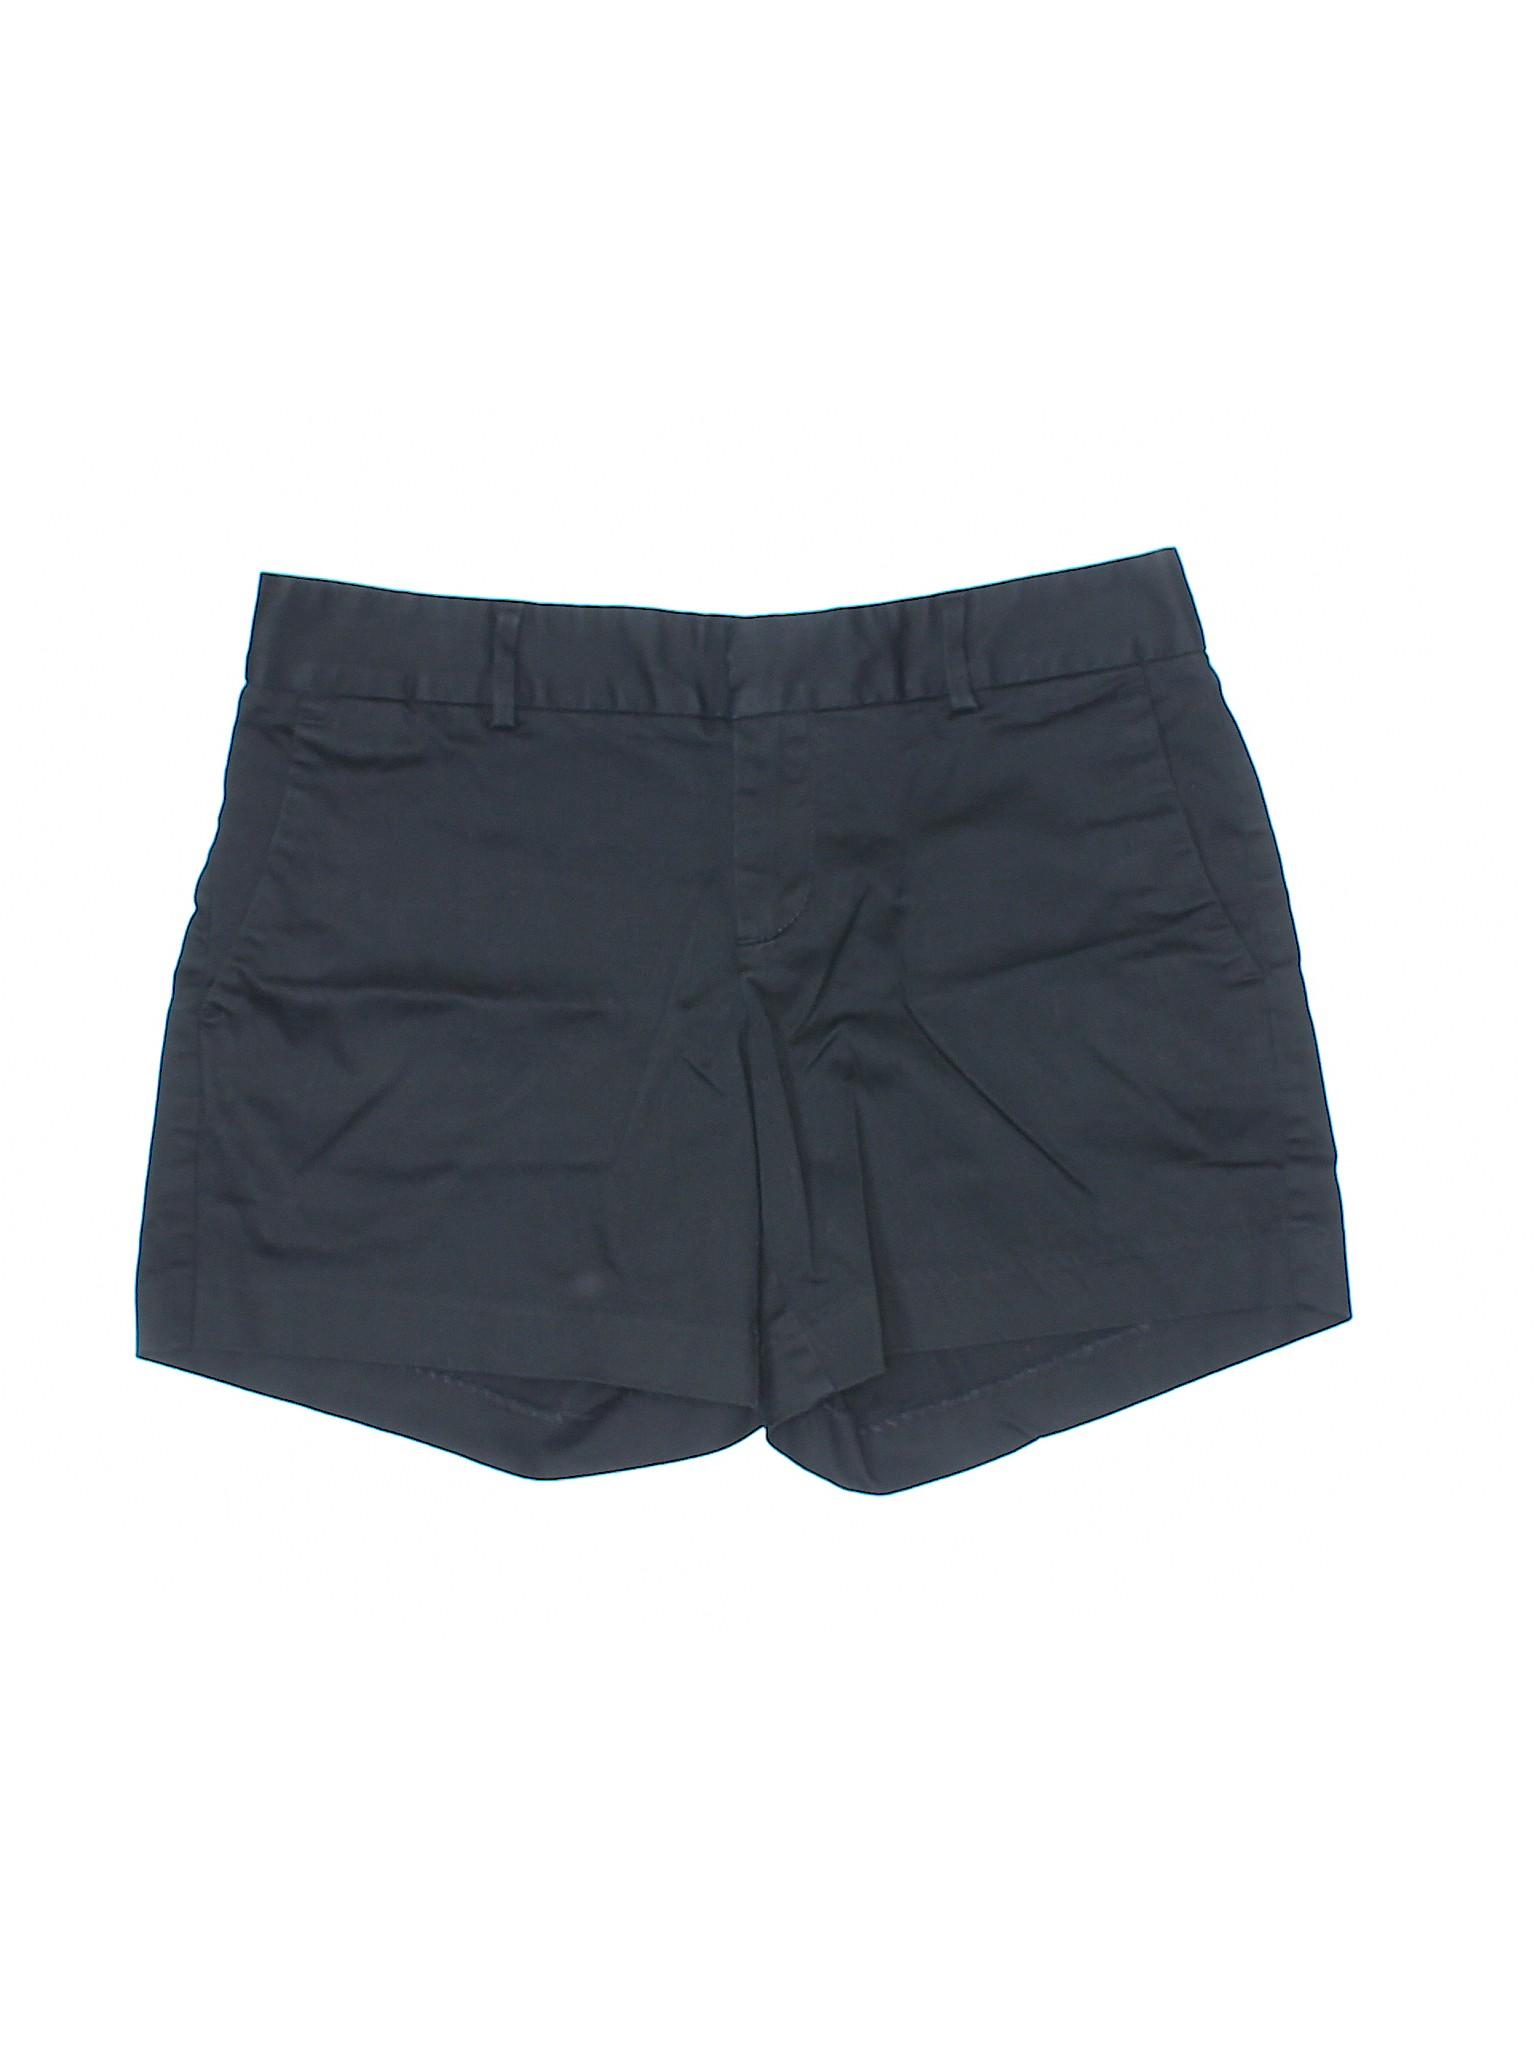 Shorts Boutique Republic Dressy winter Banana w0ZqY